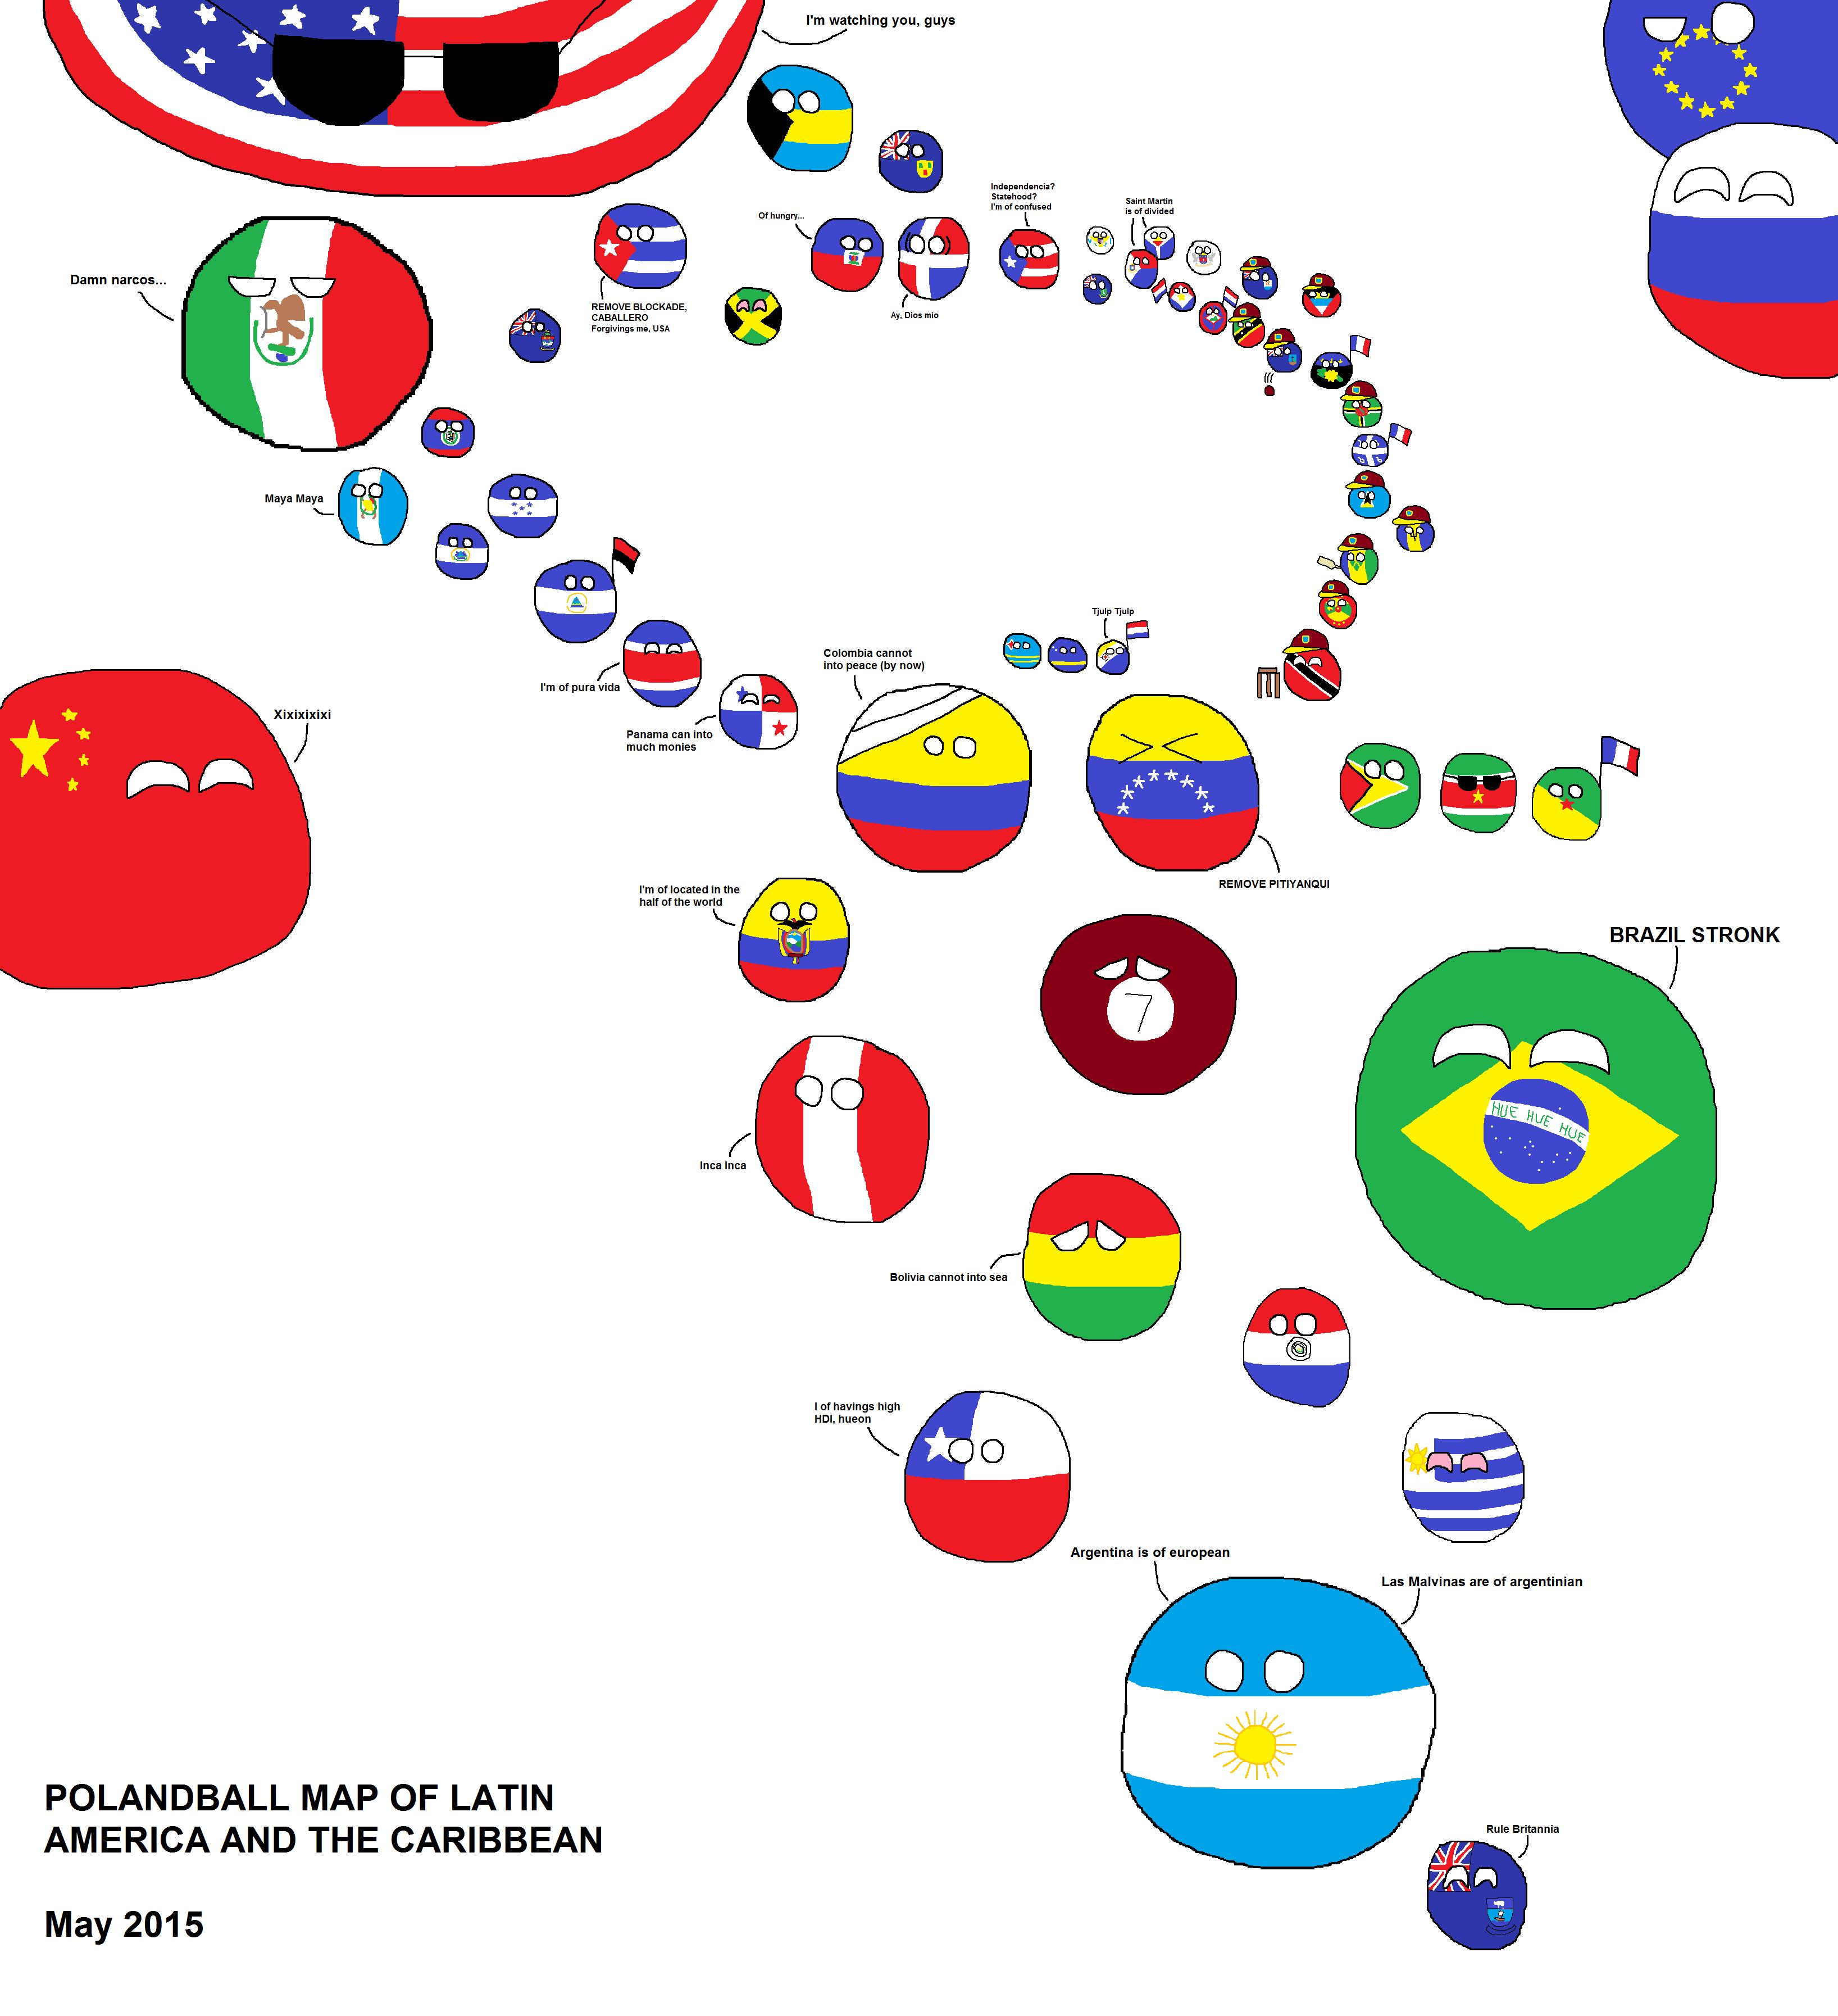 Worksheet. FilePolandball map of Latin America and the Caribbeanpng